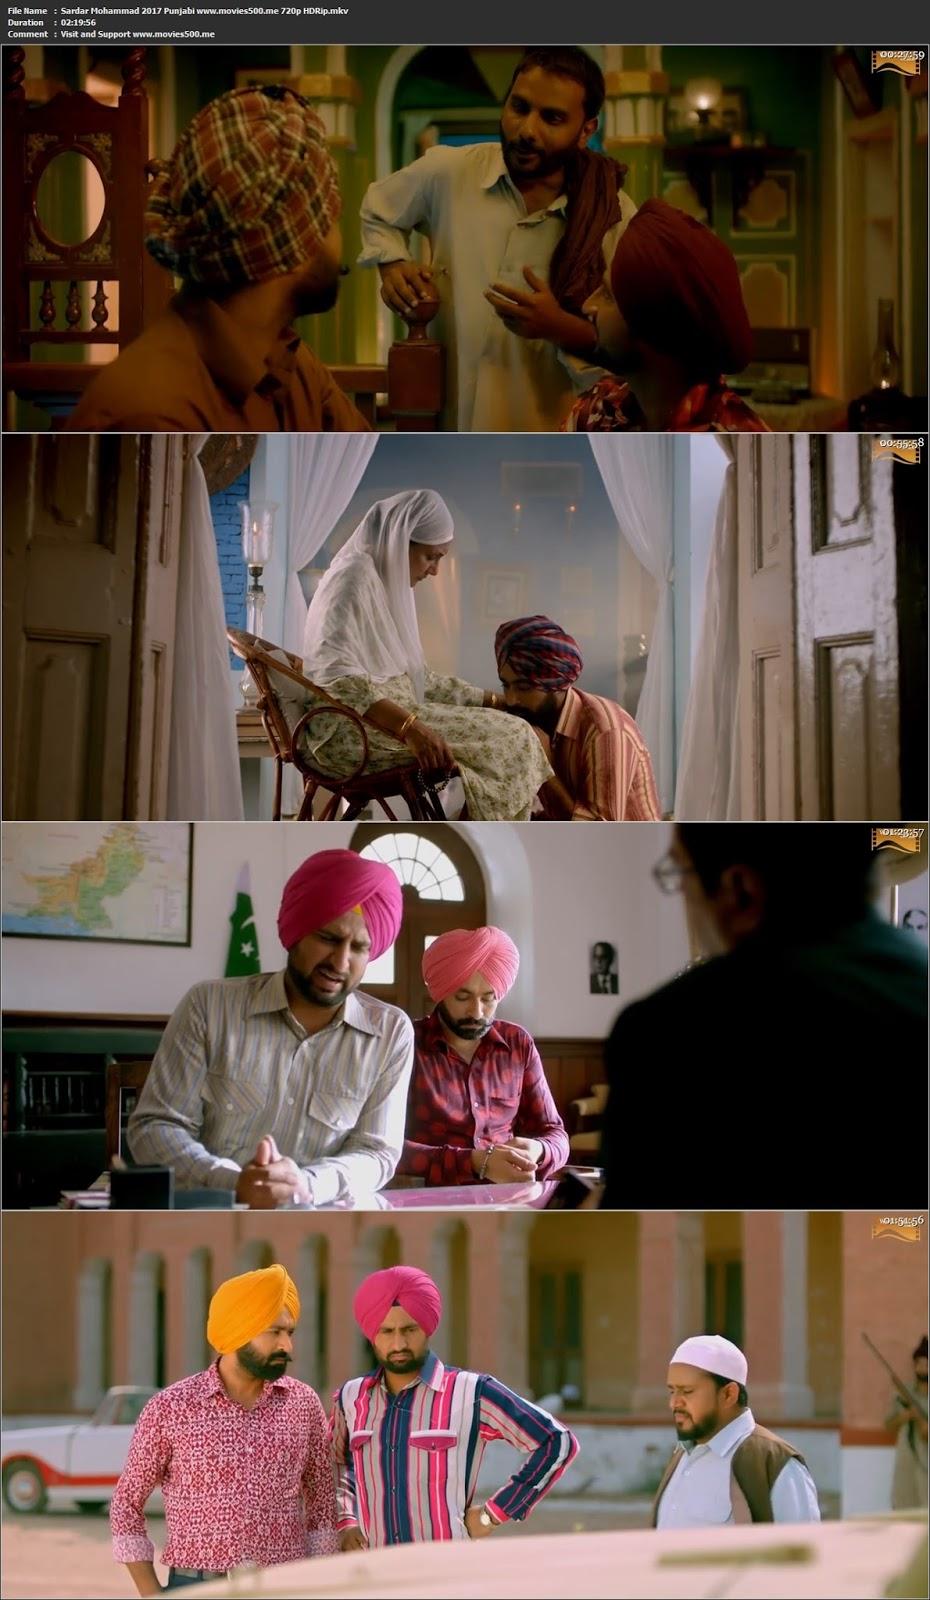 Sardar Mohammad 2017 Punjabi Full Movie HDRip 720p at gileadhomecare.com